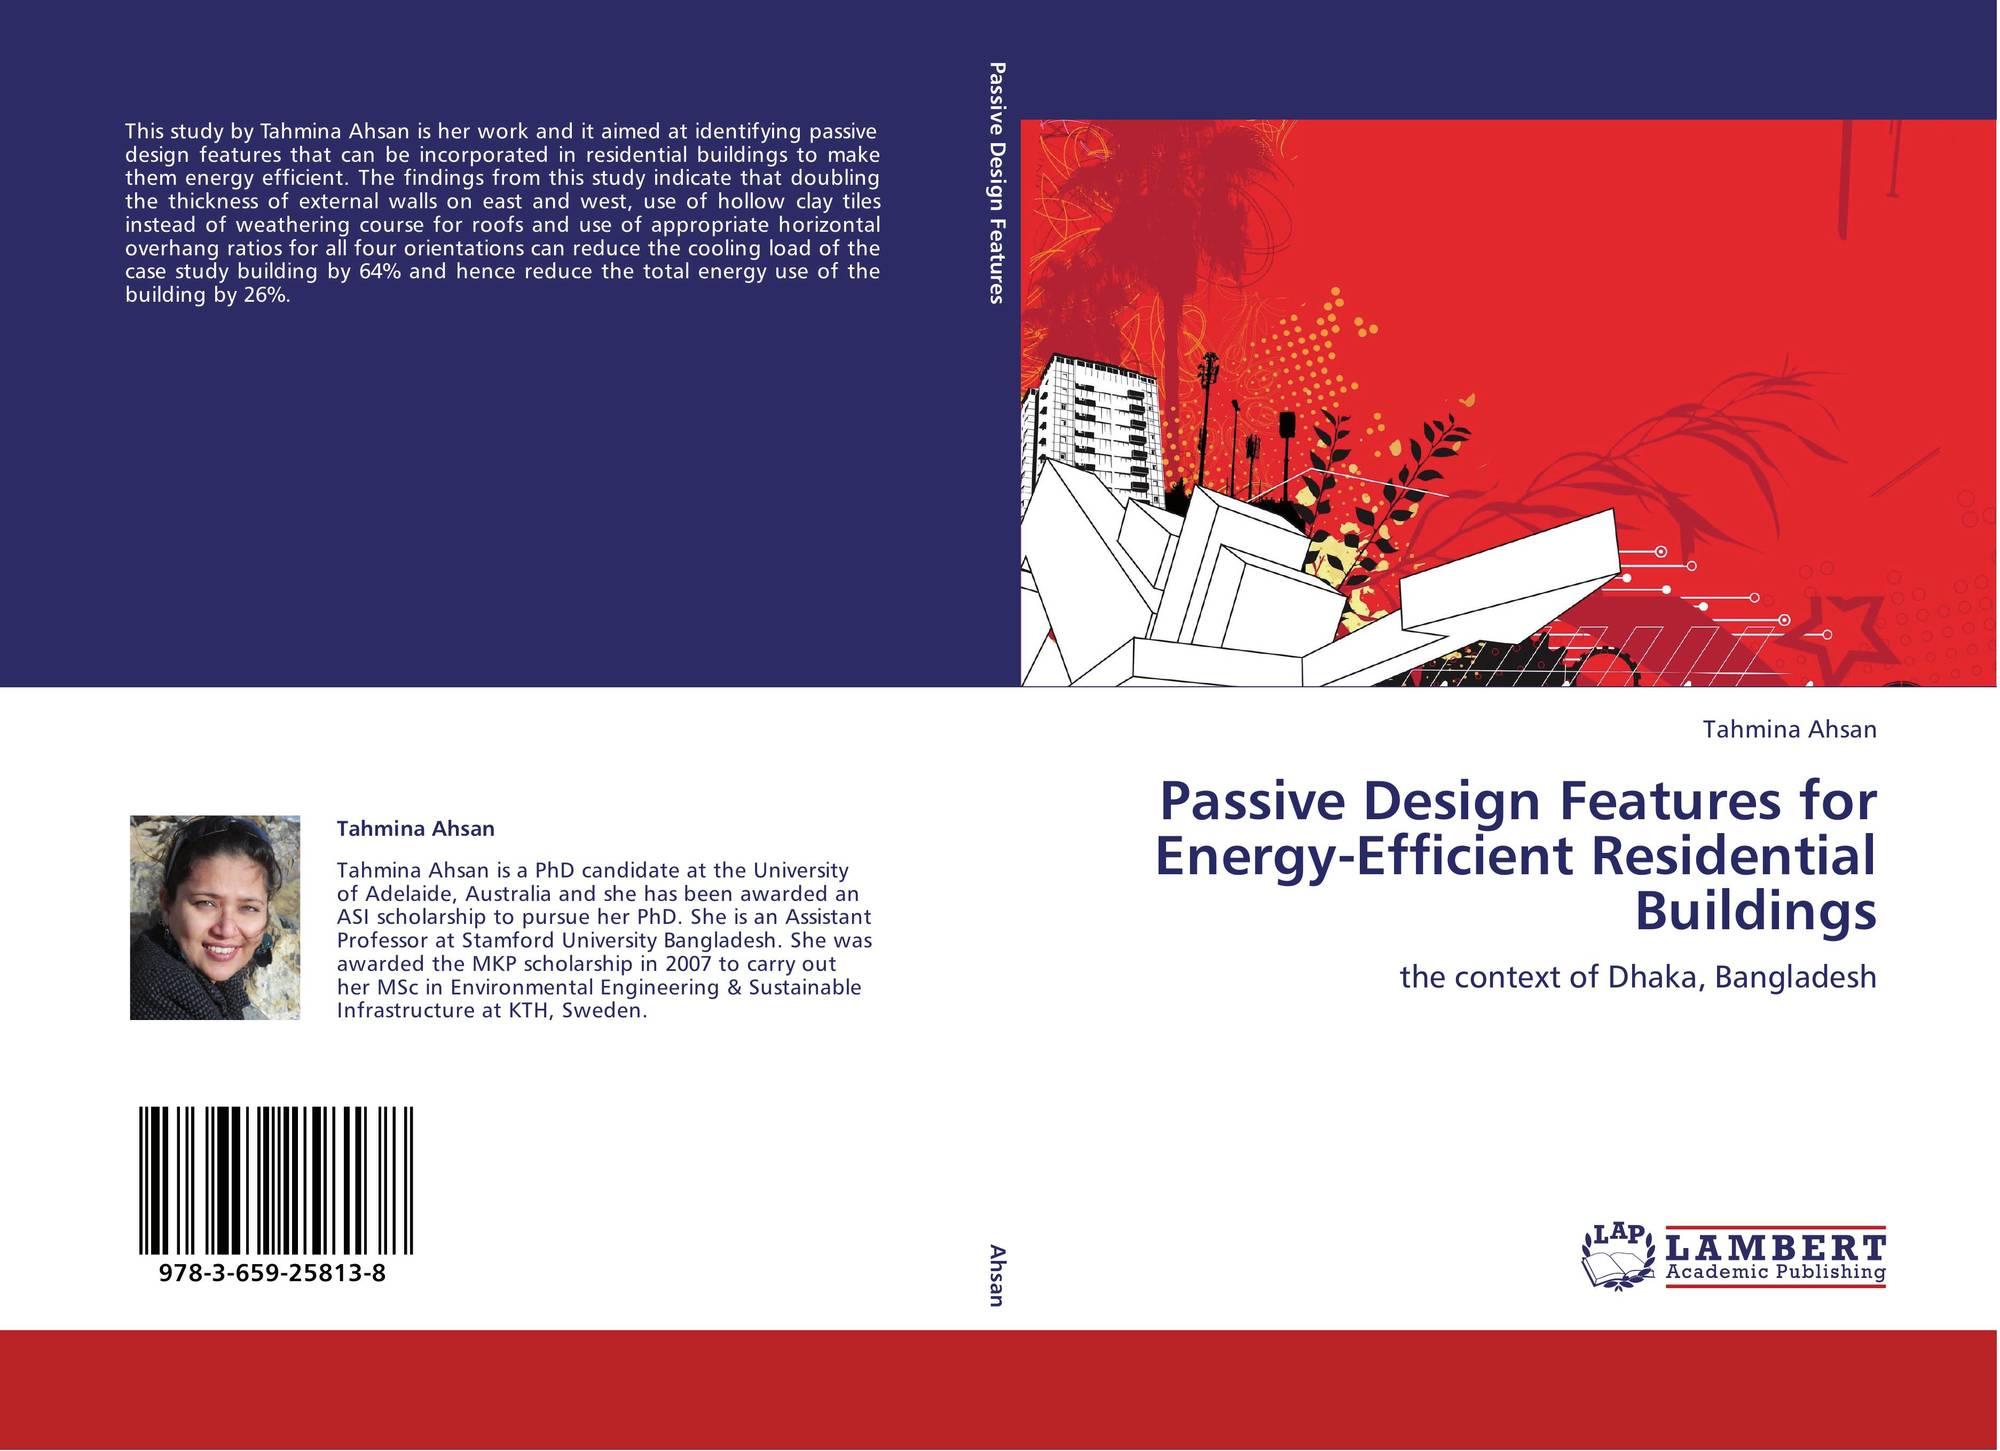 Passive Design Features For Energy Efficient Residential Buildings 978 3 659 25813 8